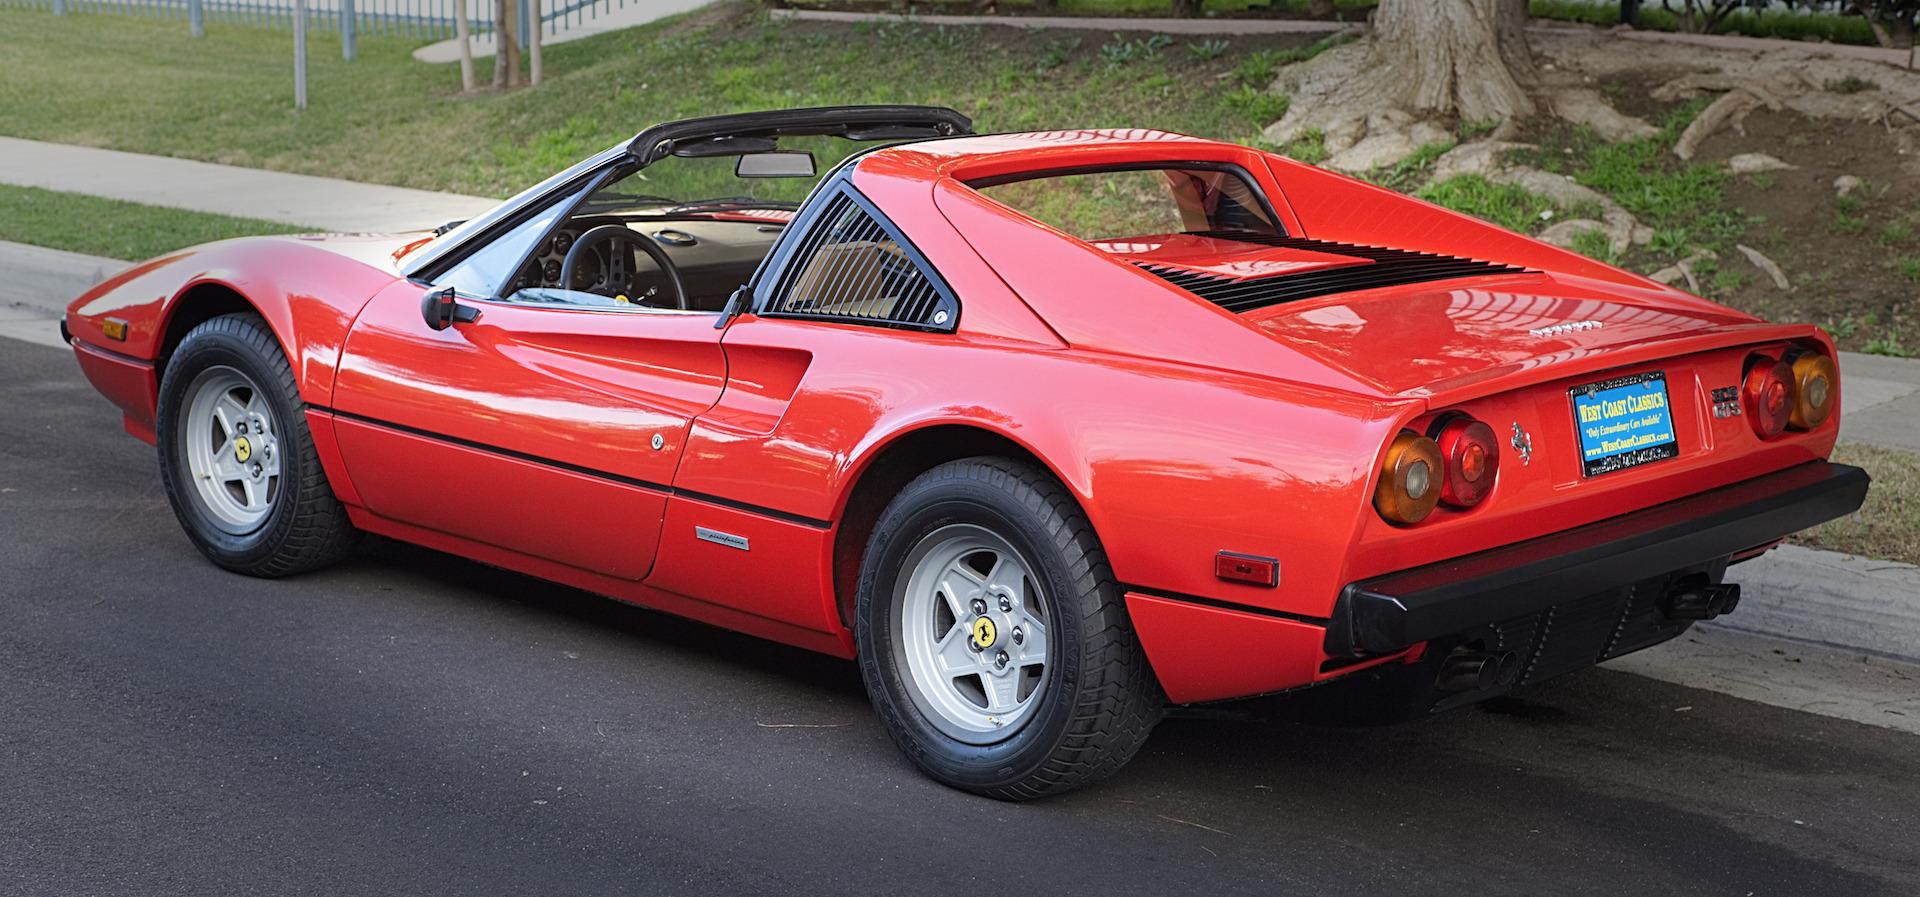 1979 Ferrari 308 Gts Spyder Stock 847 For Sale Near